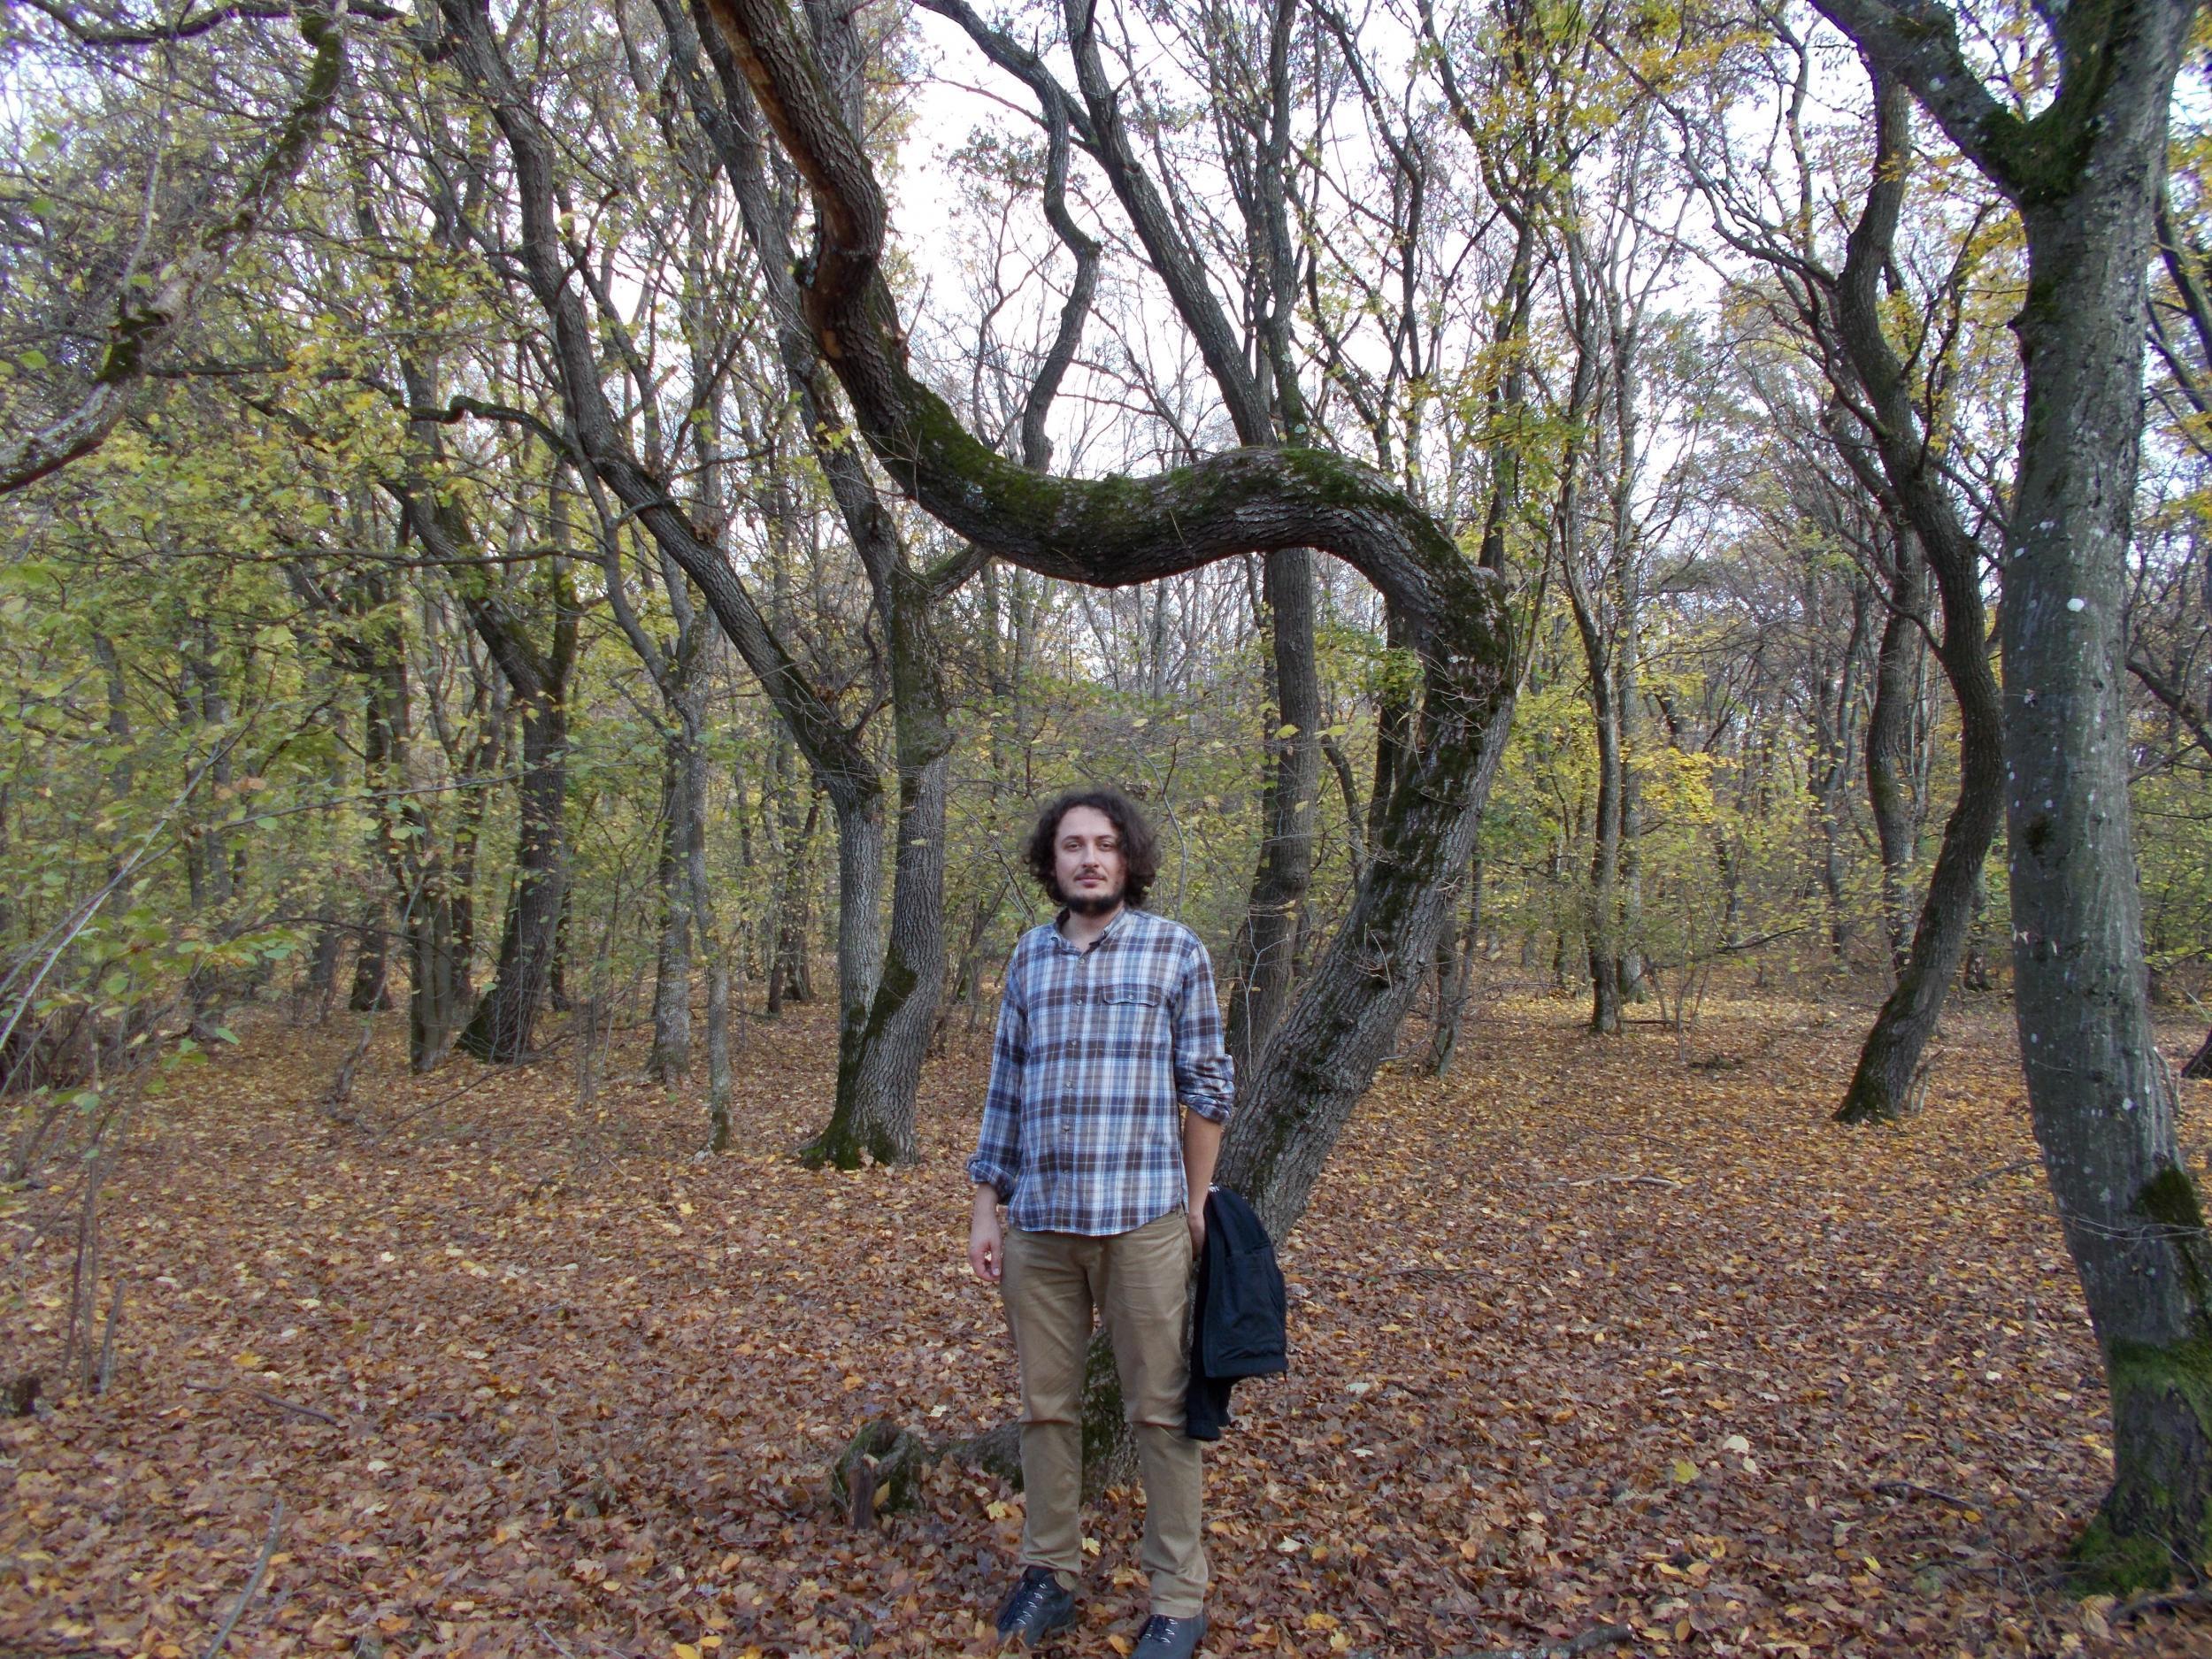 Hoia Baciu: Inside the creepiest forest in Transylvania